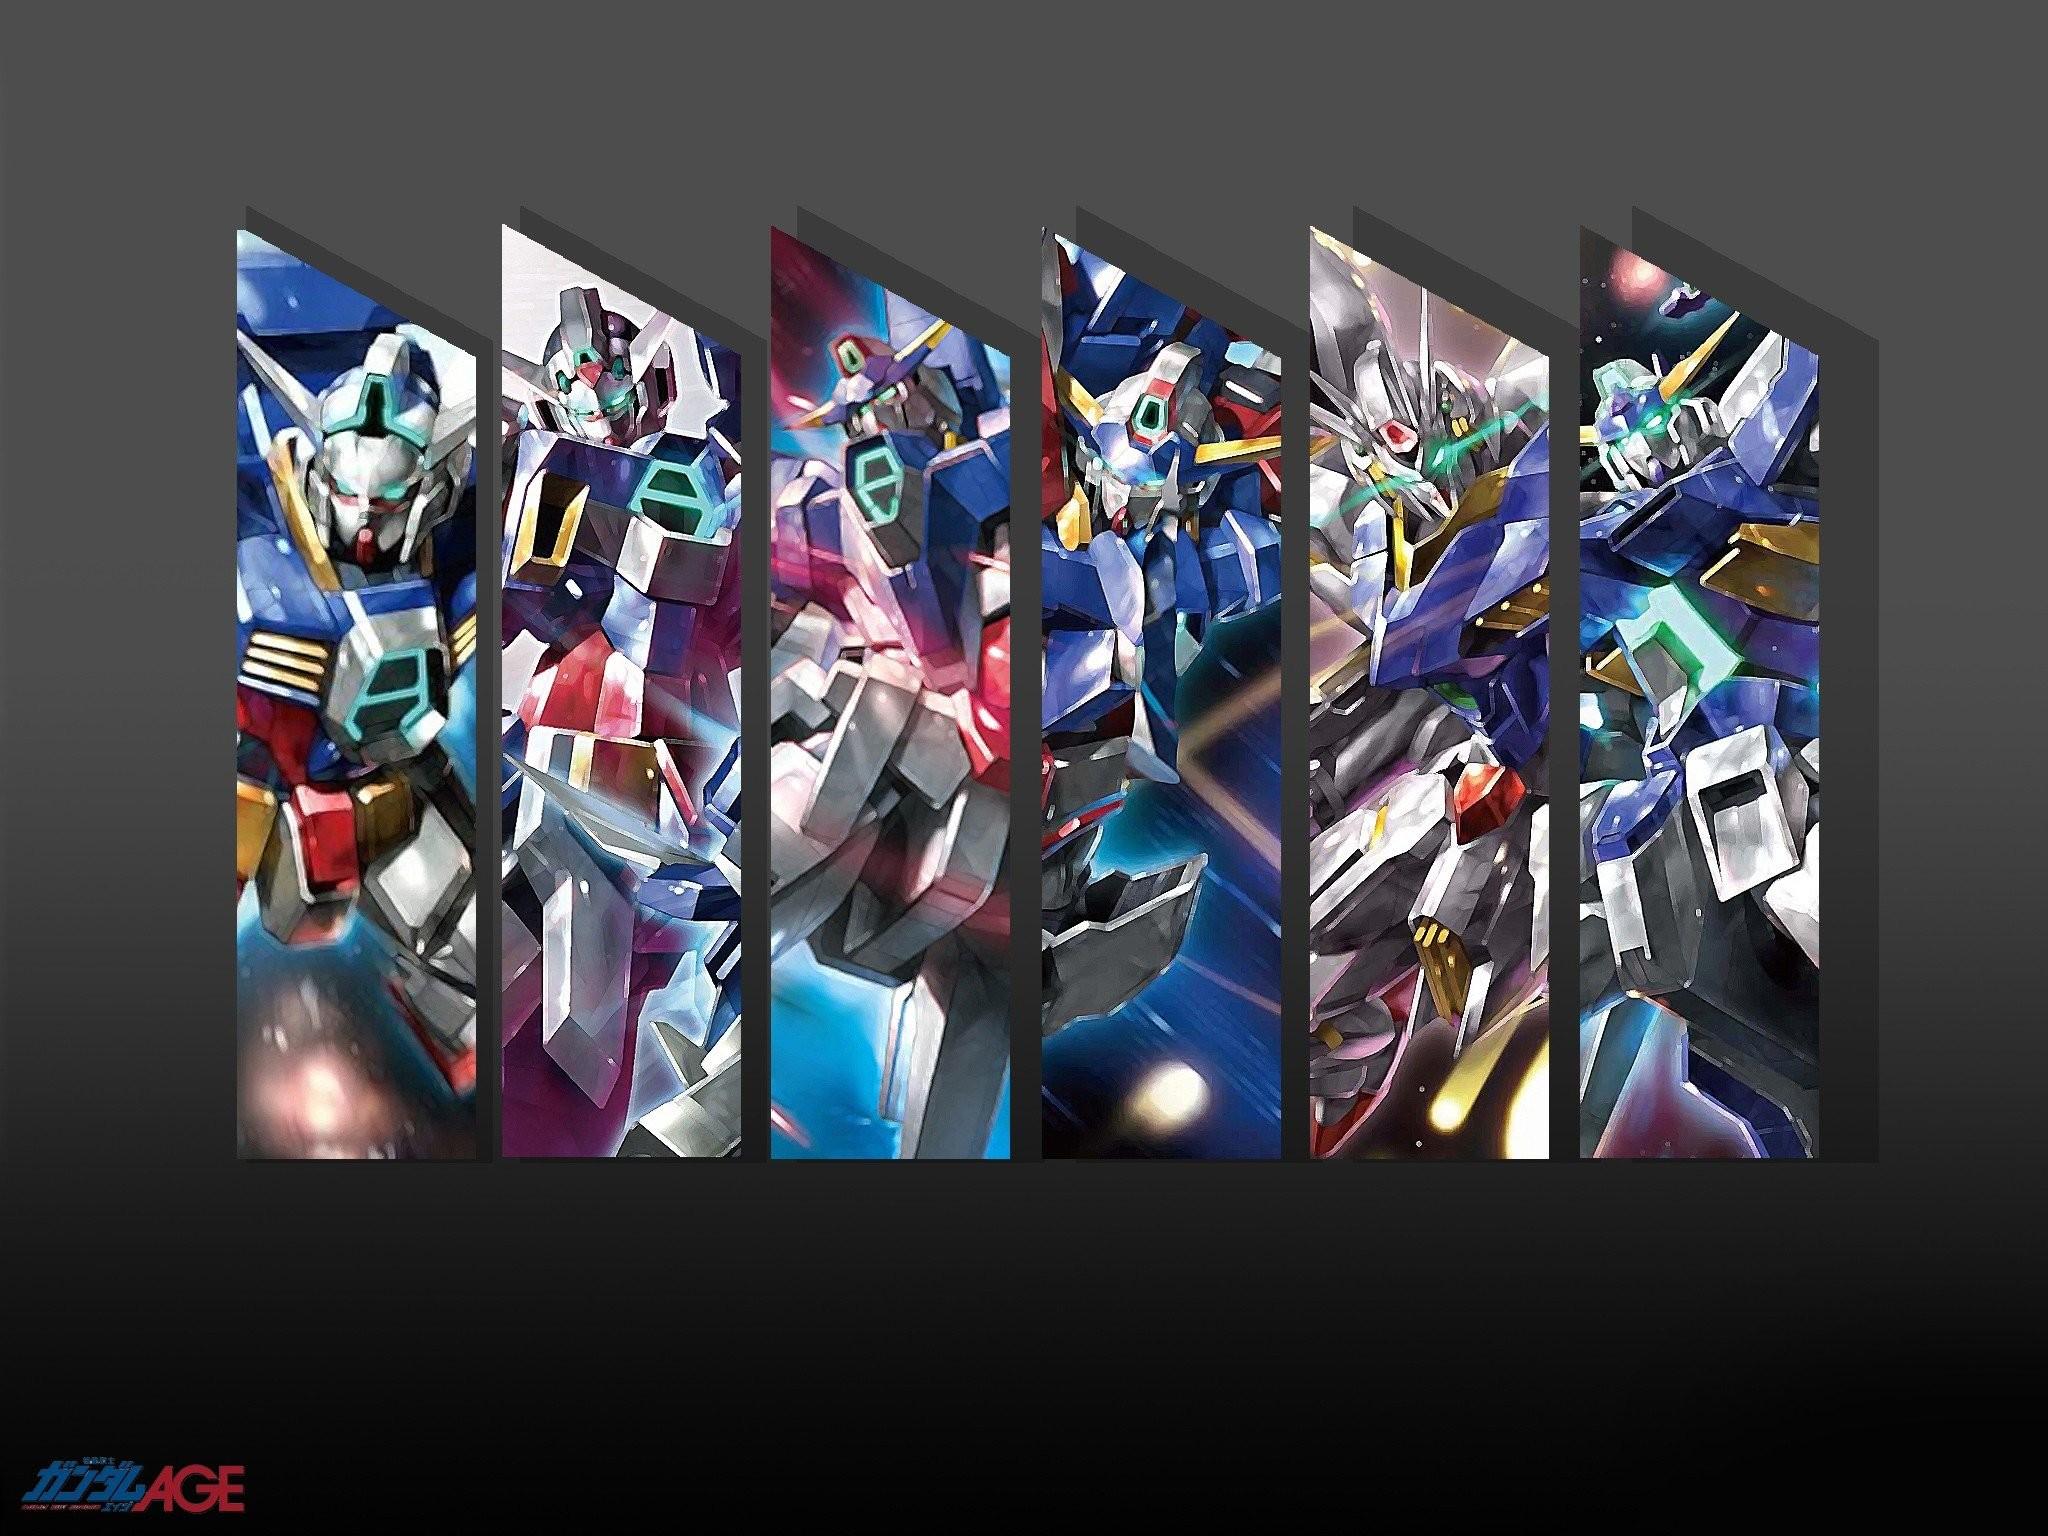 Gundam 00 hd wallpaper 71 images 1920x1080 robot mobile suit z gundam gundam wallpapers hd desktop and mobile backgrounds voltagebd Images